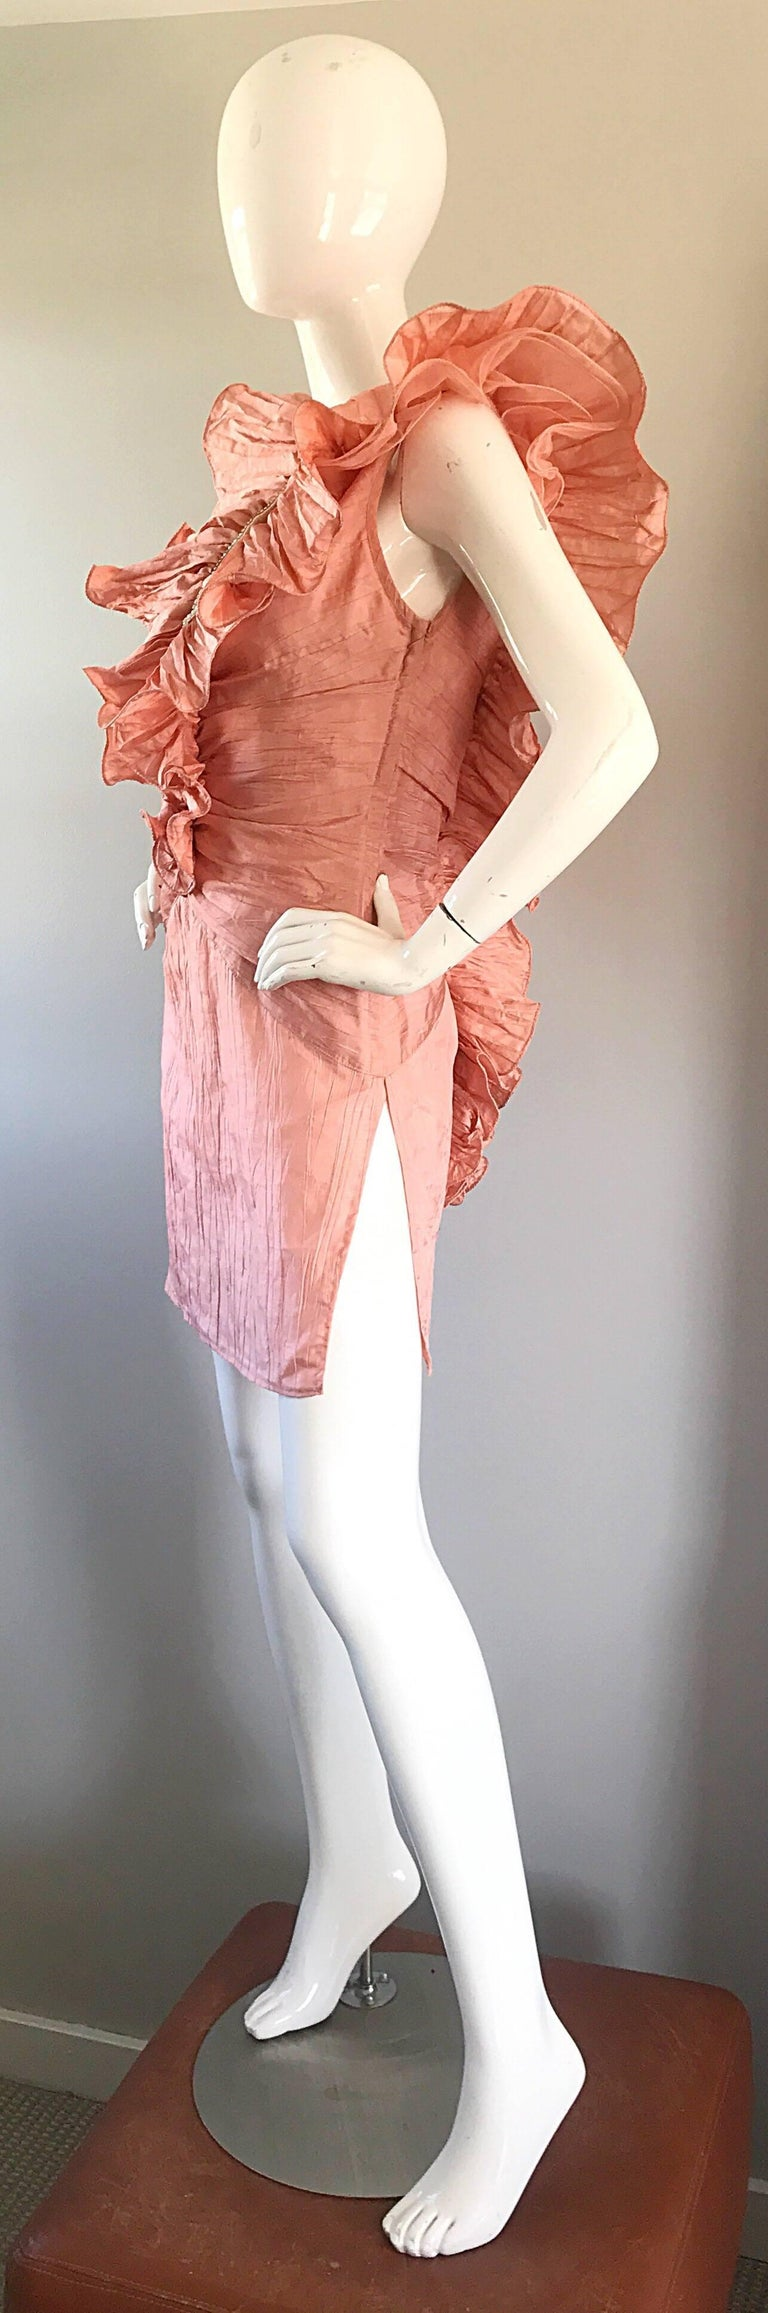 Women's Avant Garde 1980s Pink Rhinestones + Ruffles   Sleeveless 80s Cocktail Dress For Sale